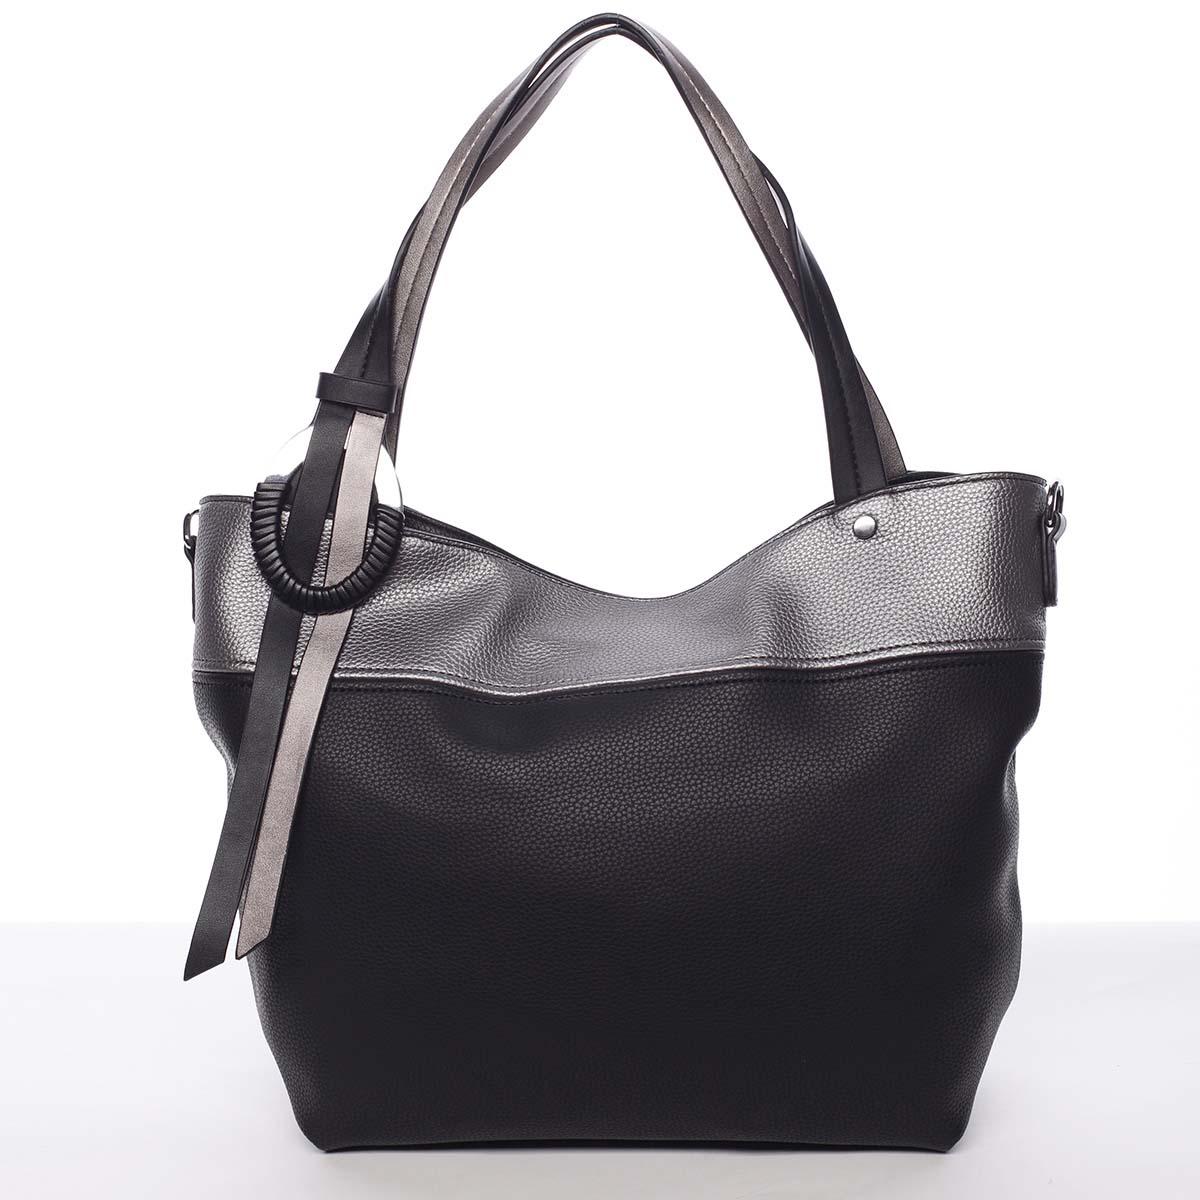 Moderná a elegantná dámska kabelka cez rameno čierna - Maria C Sahar čierna